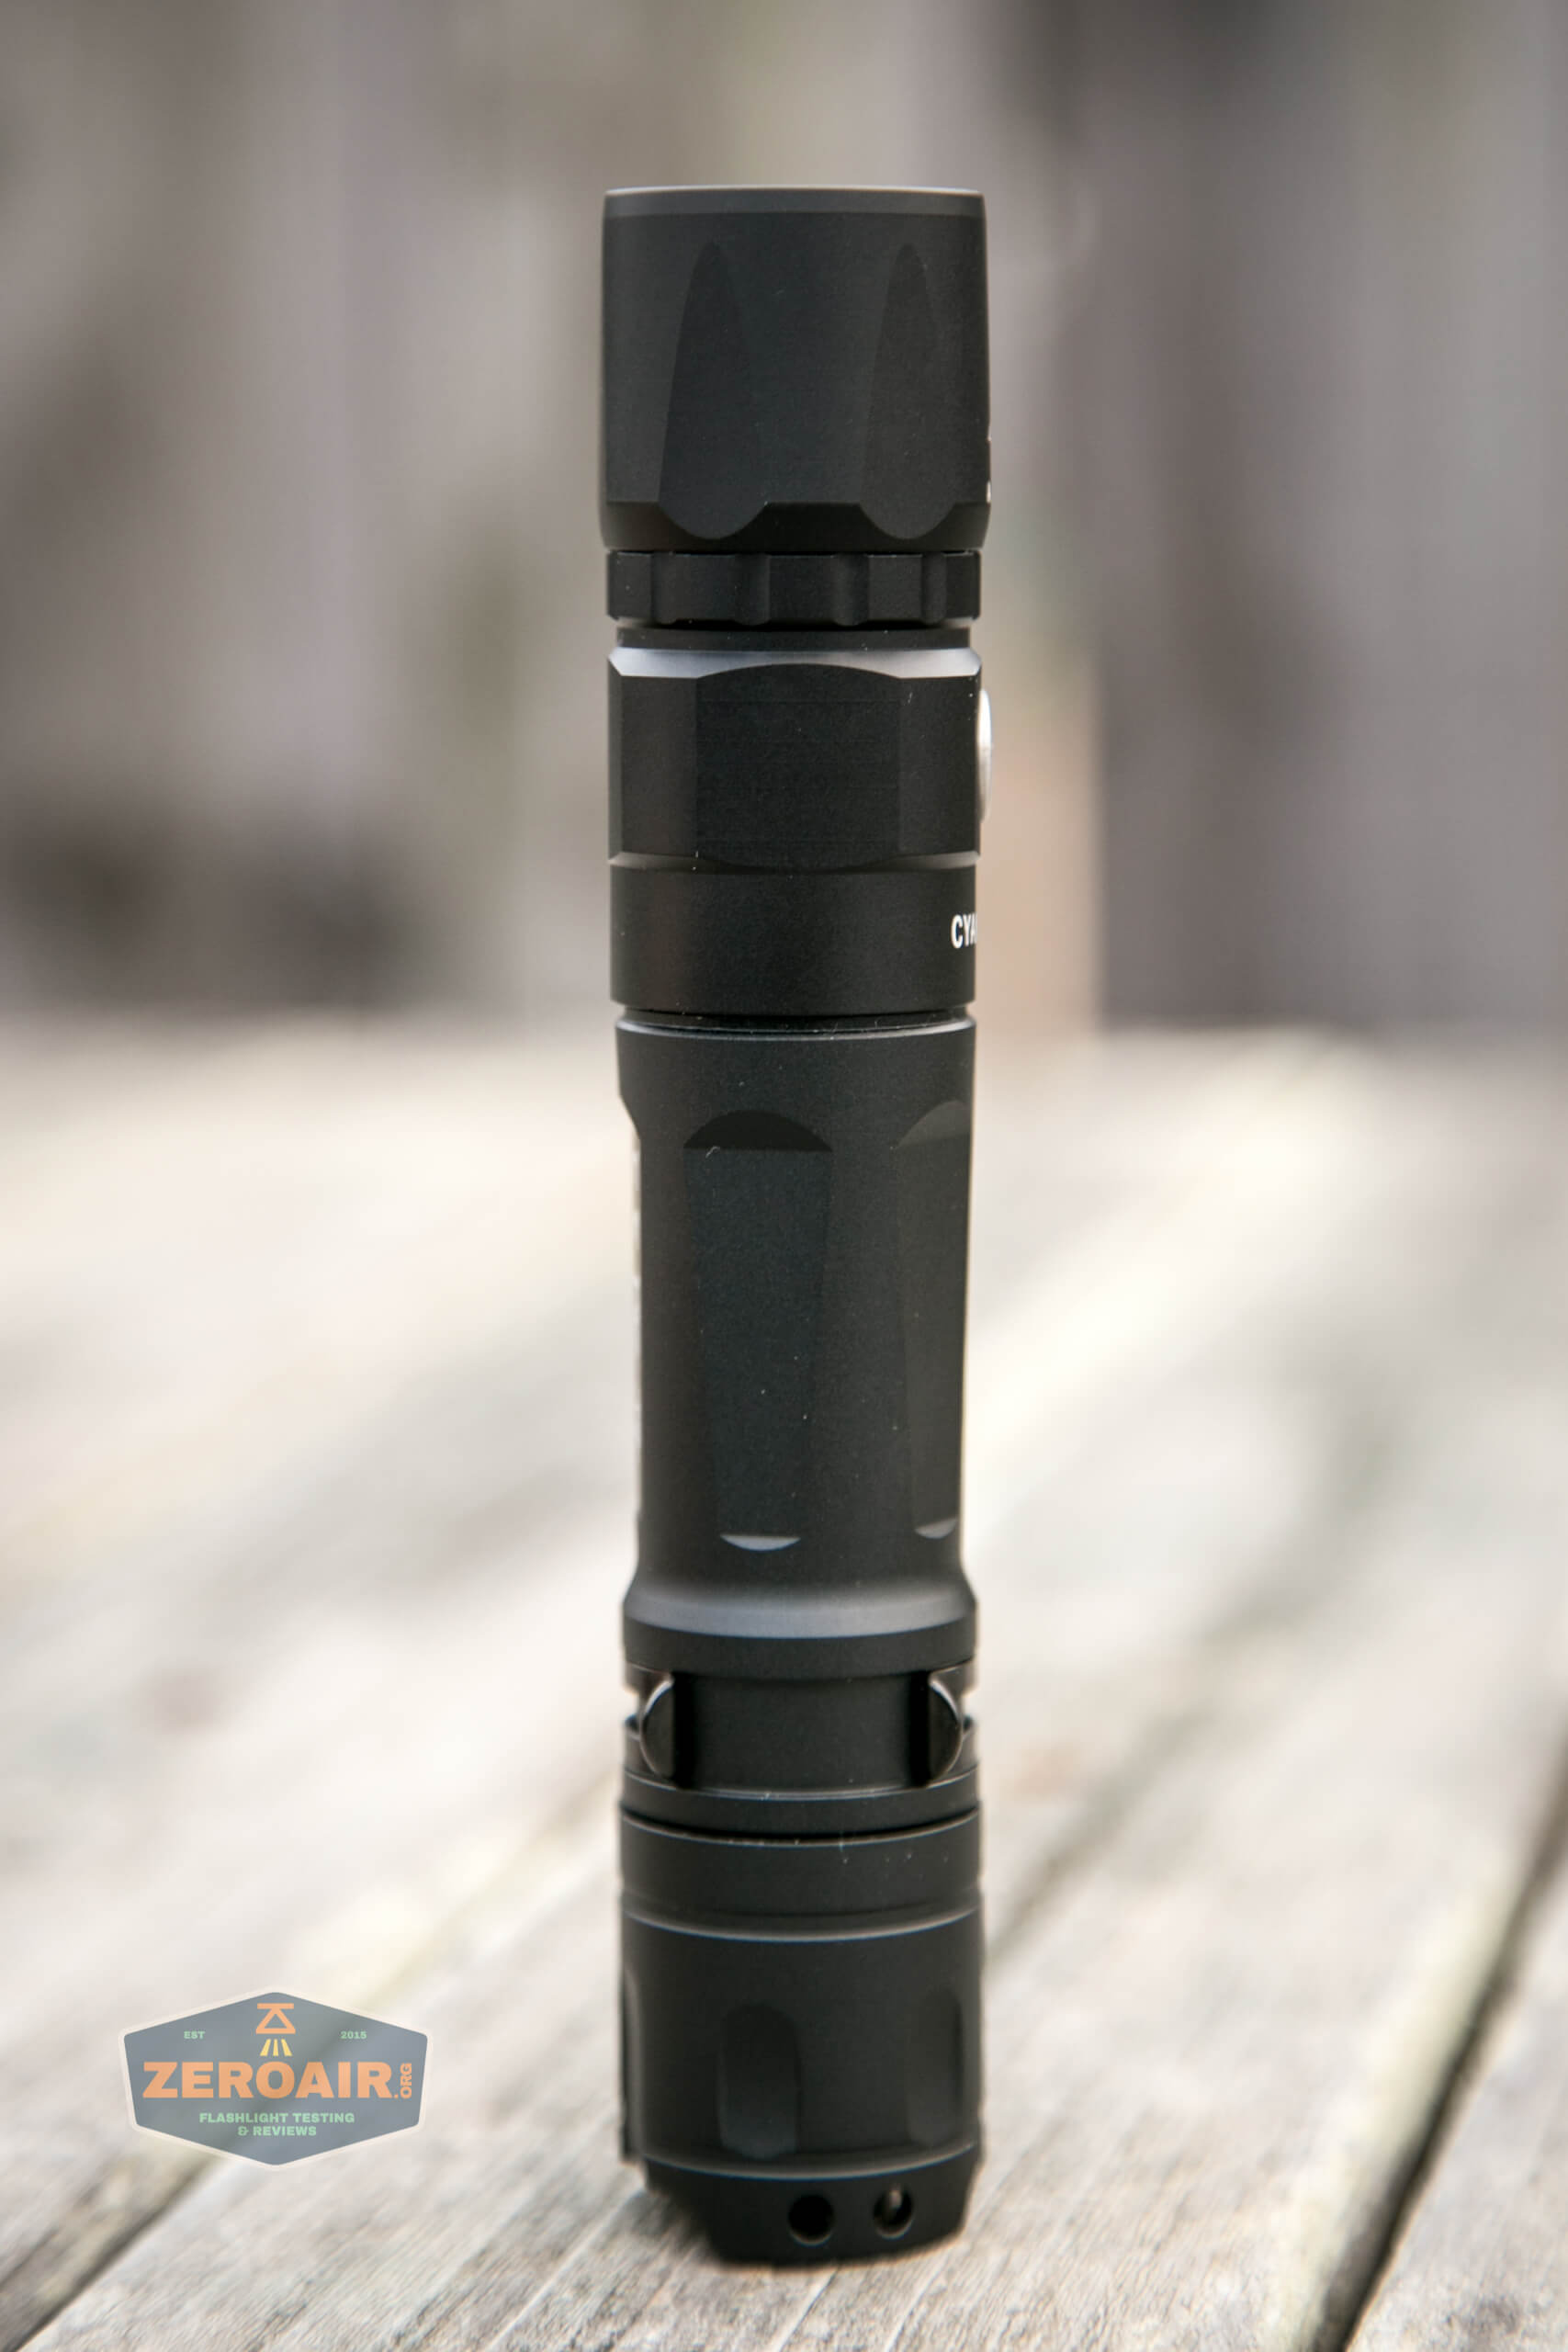 Cyansky P25 Flashlight four sides